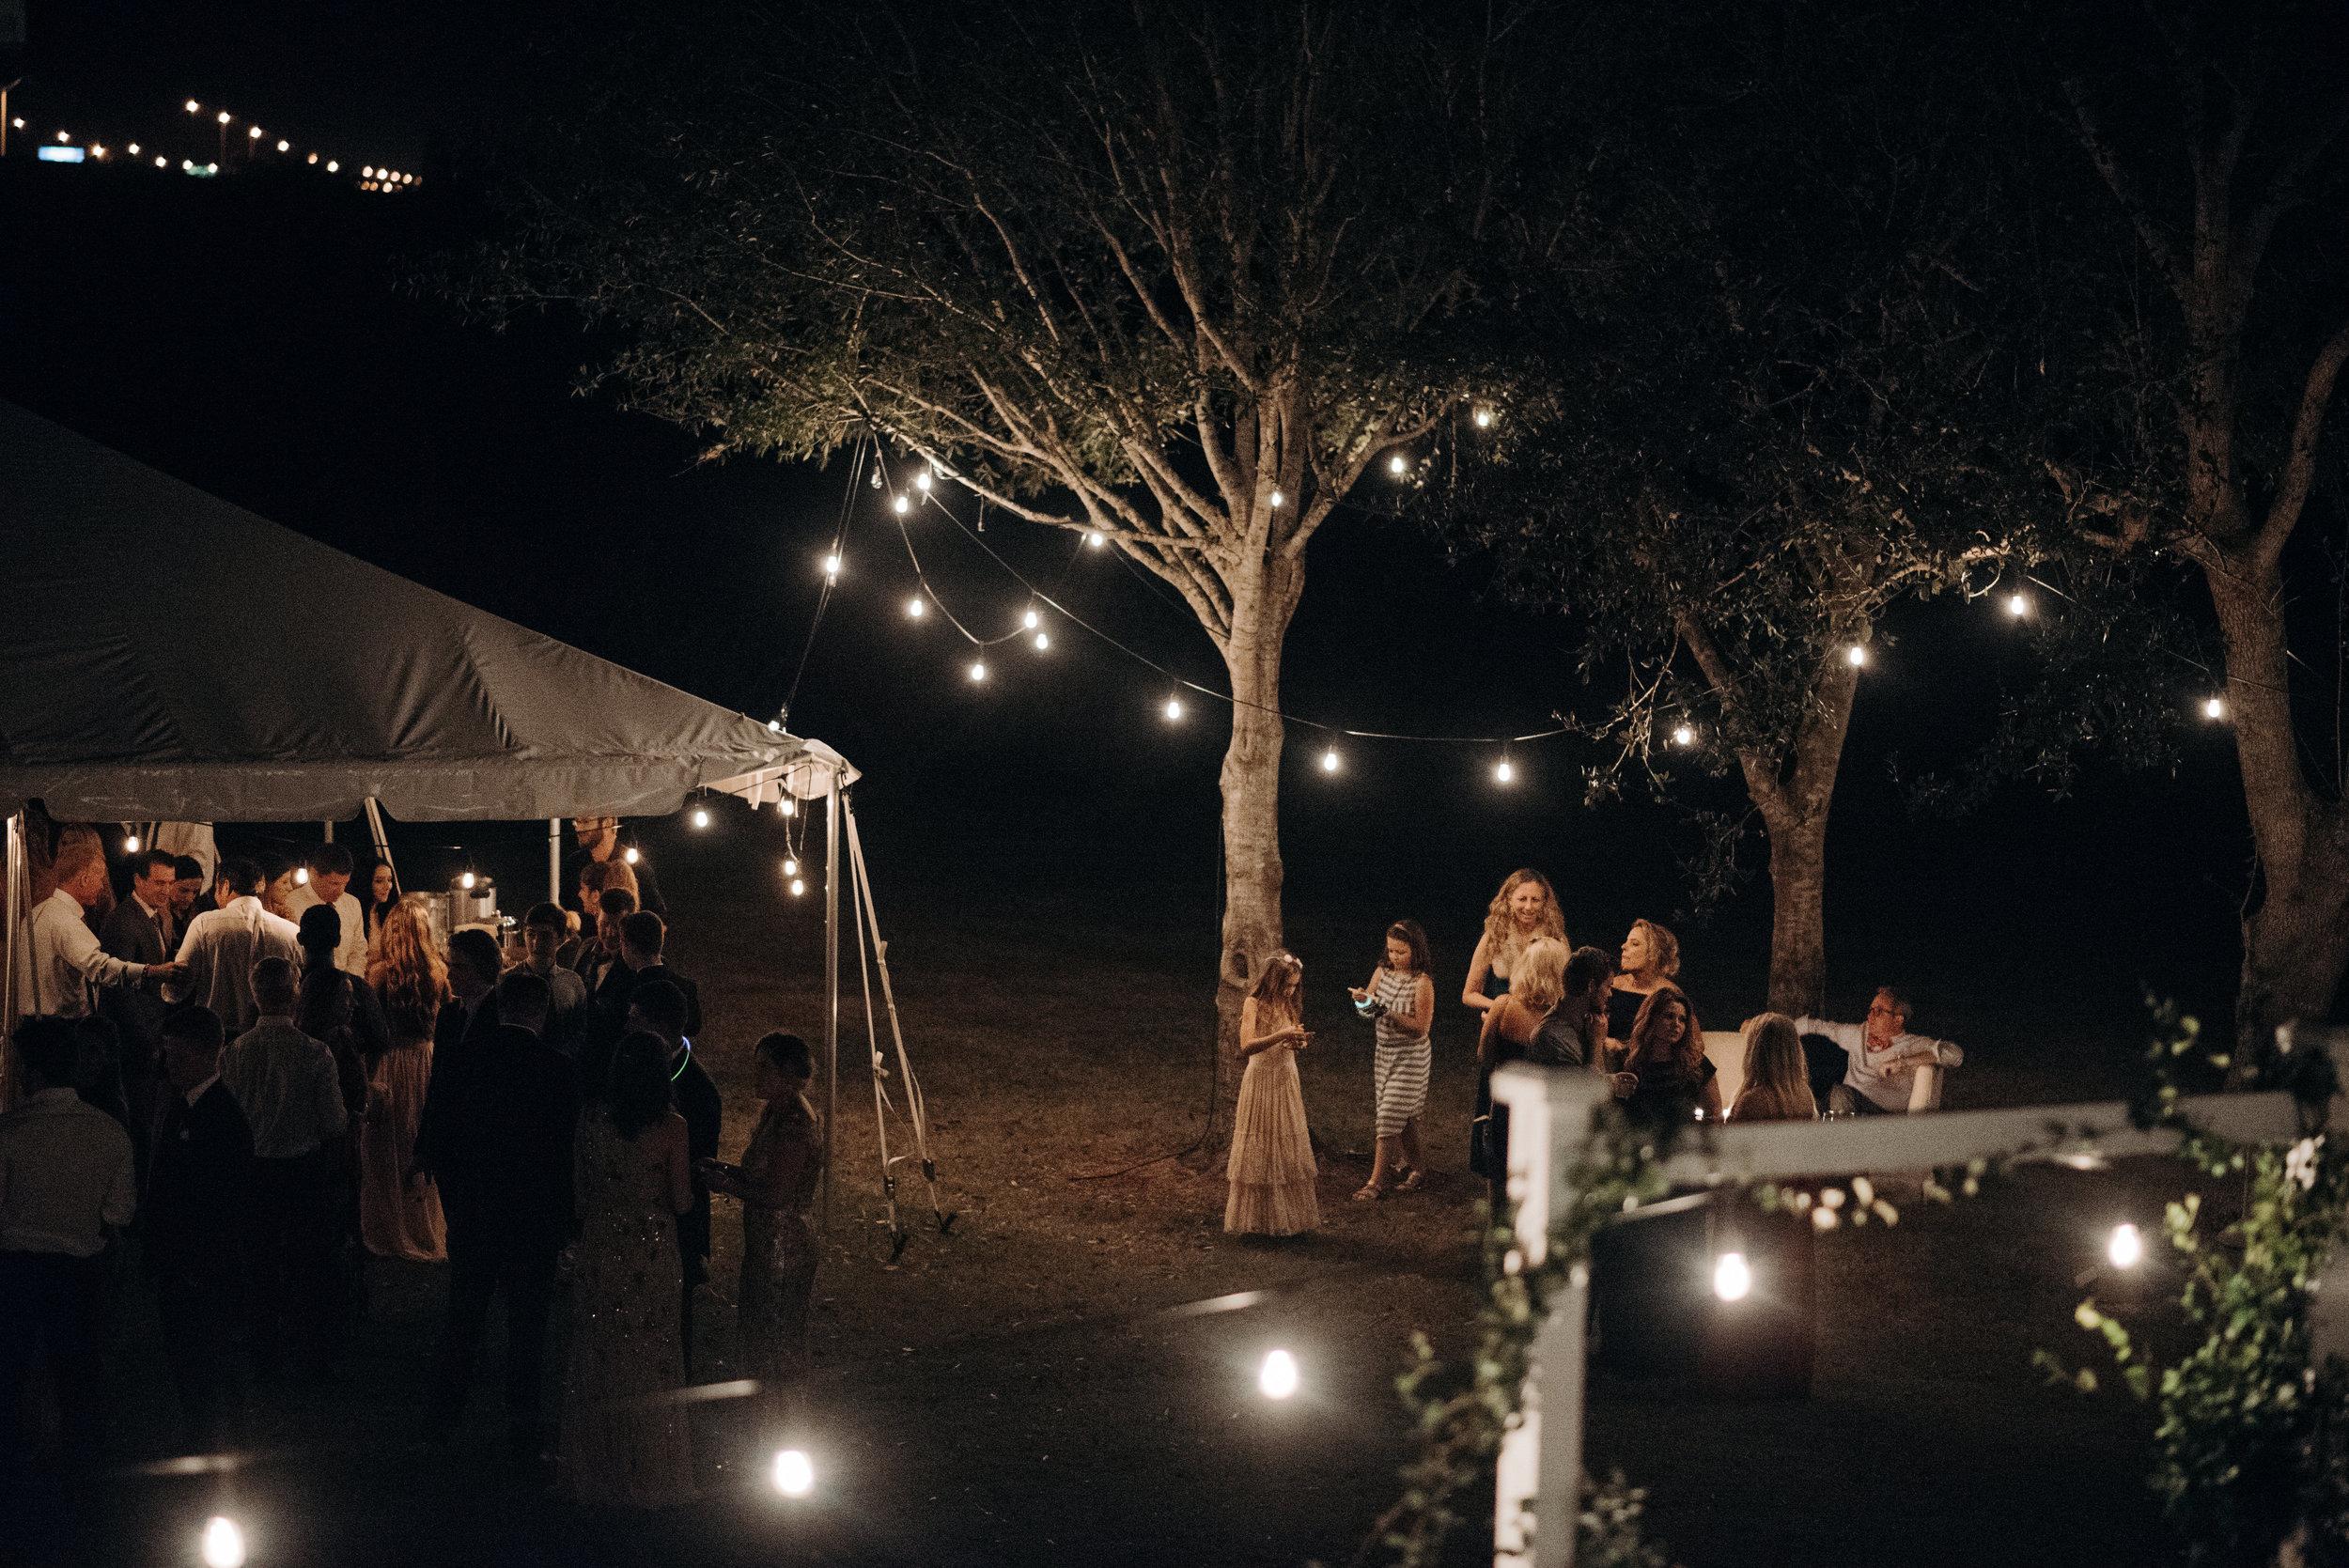 micayla-greyson-neumann-vero-beach-lake-house-winter-white-wedding-photography-1394.jpg